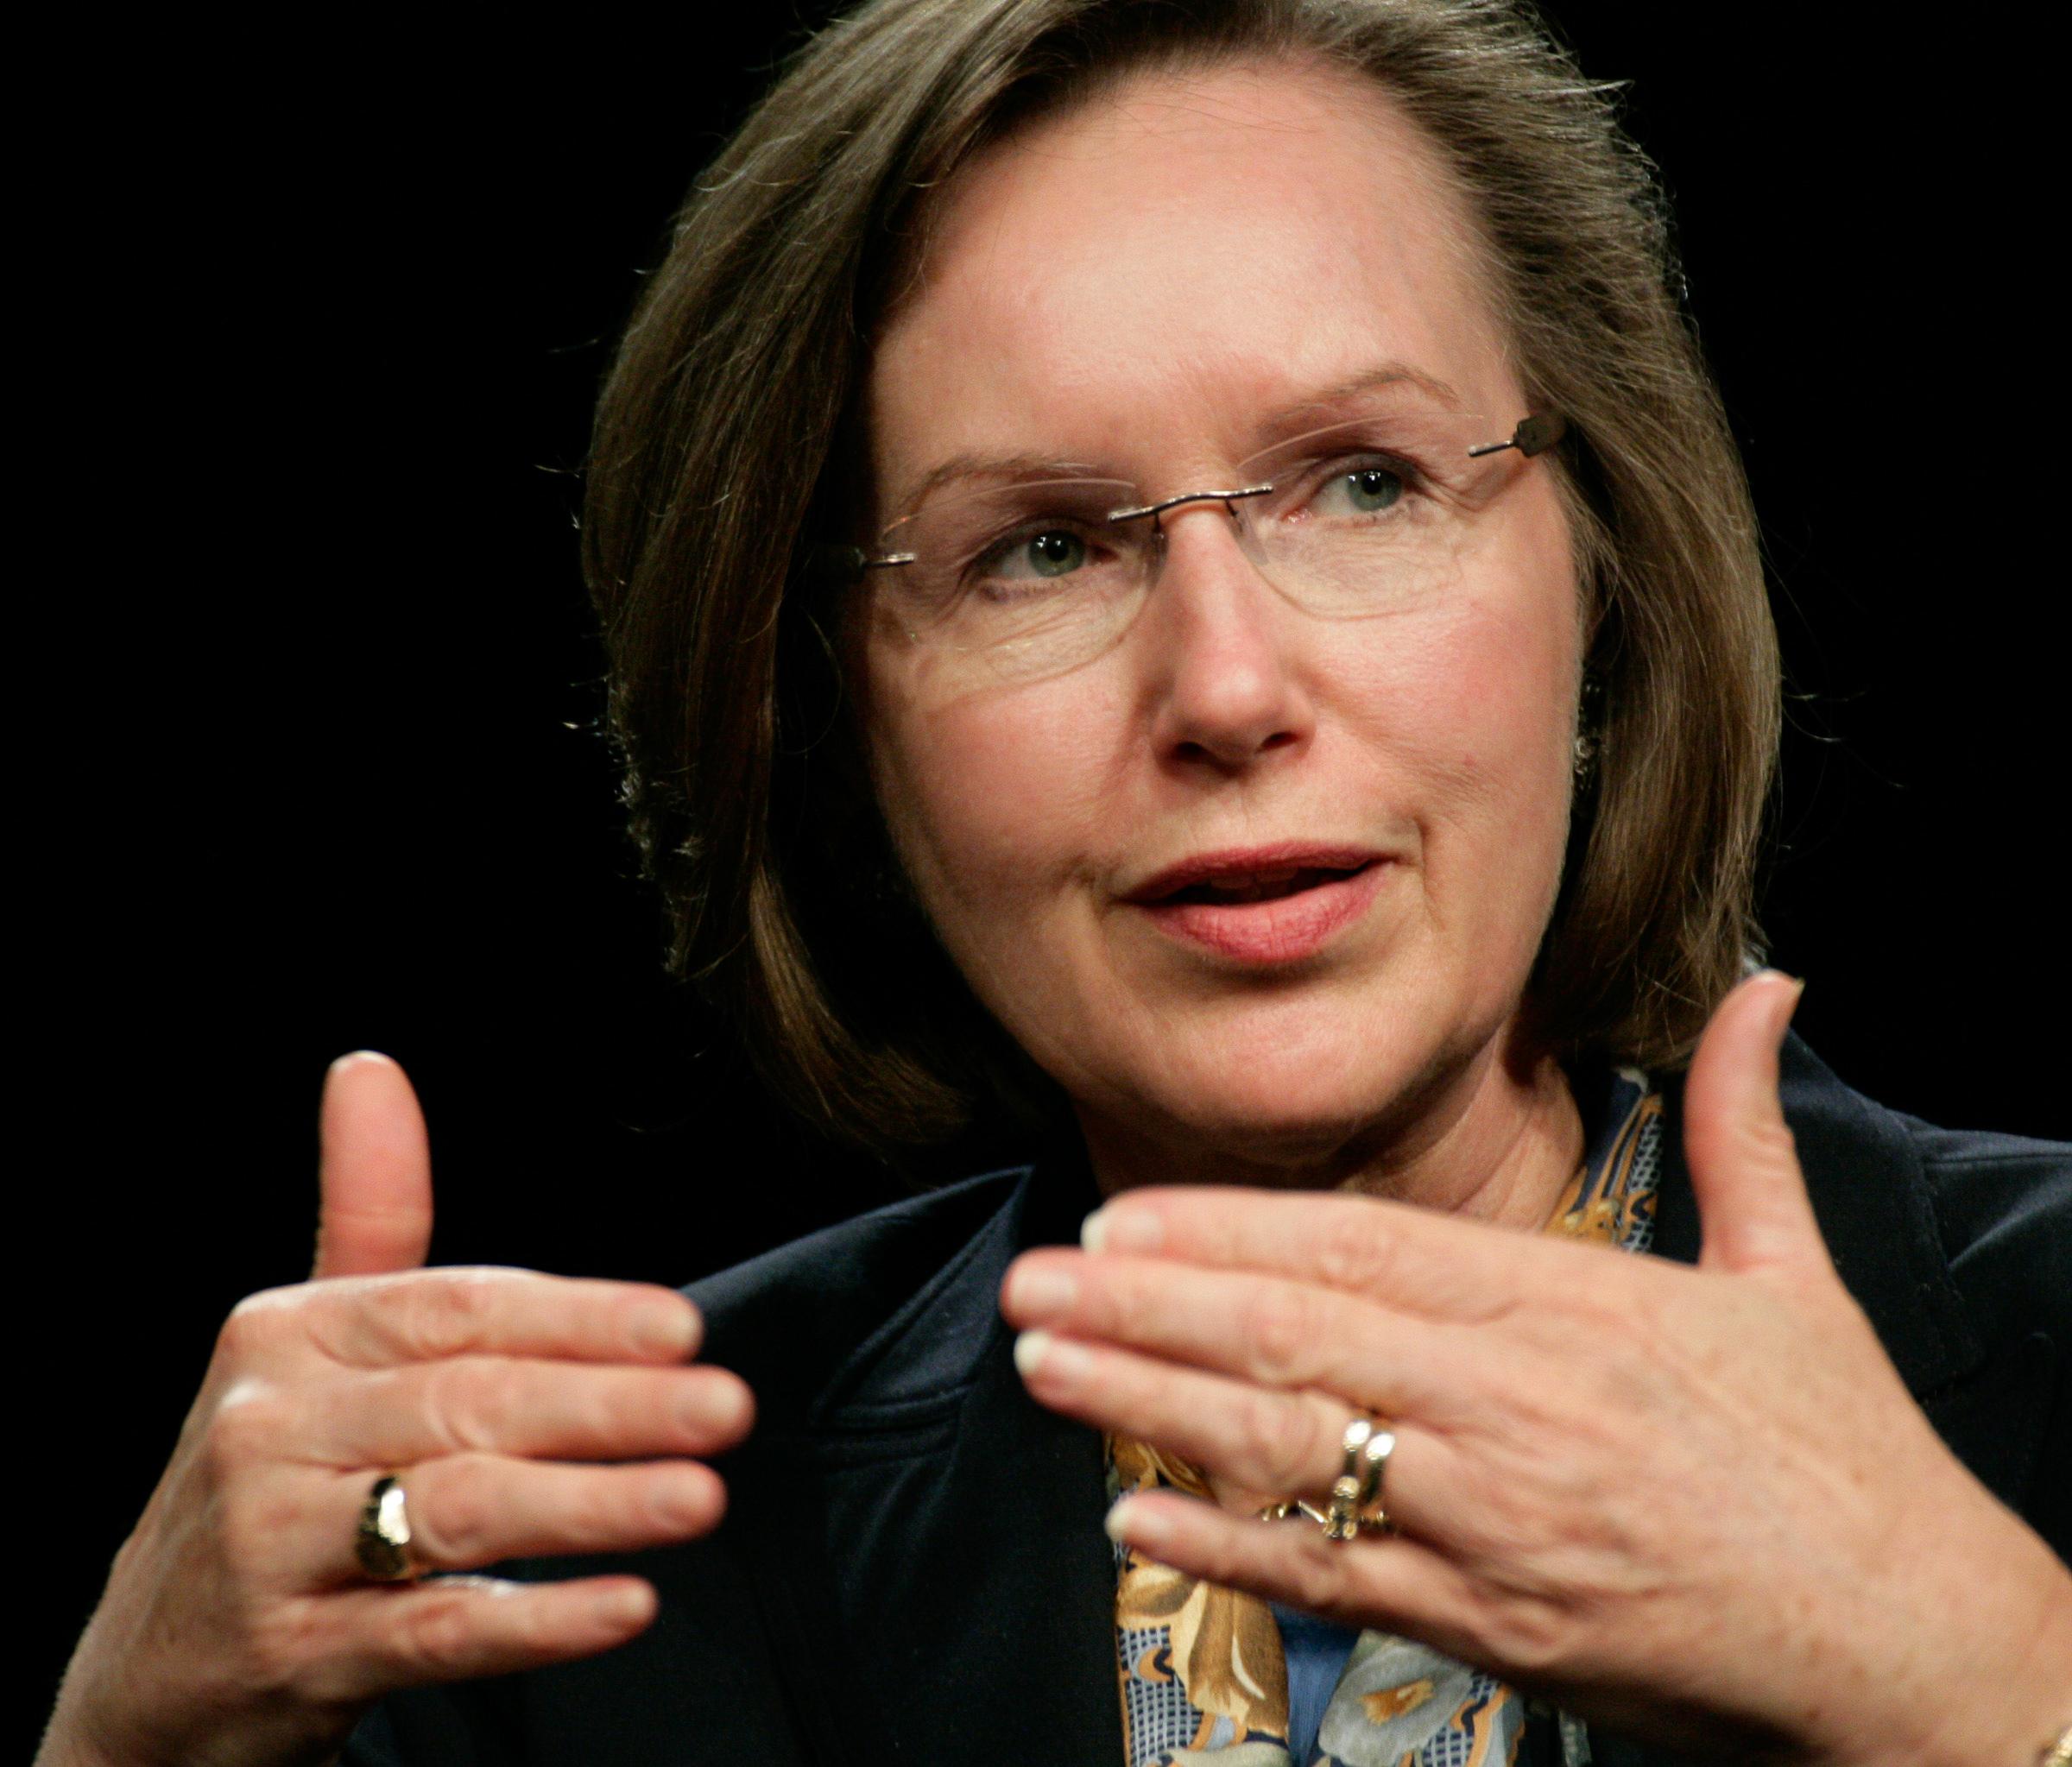 Lynn Elsenhans, former Sunoco chairman, is Saudi Aramco's first female director